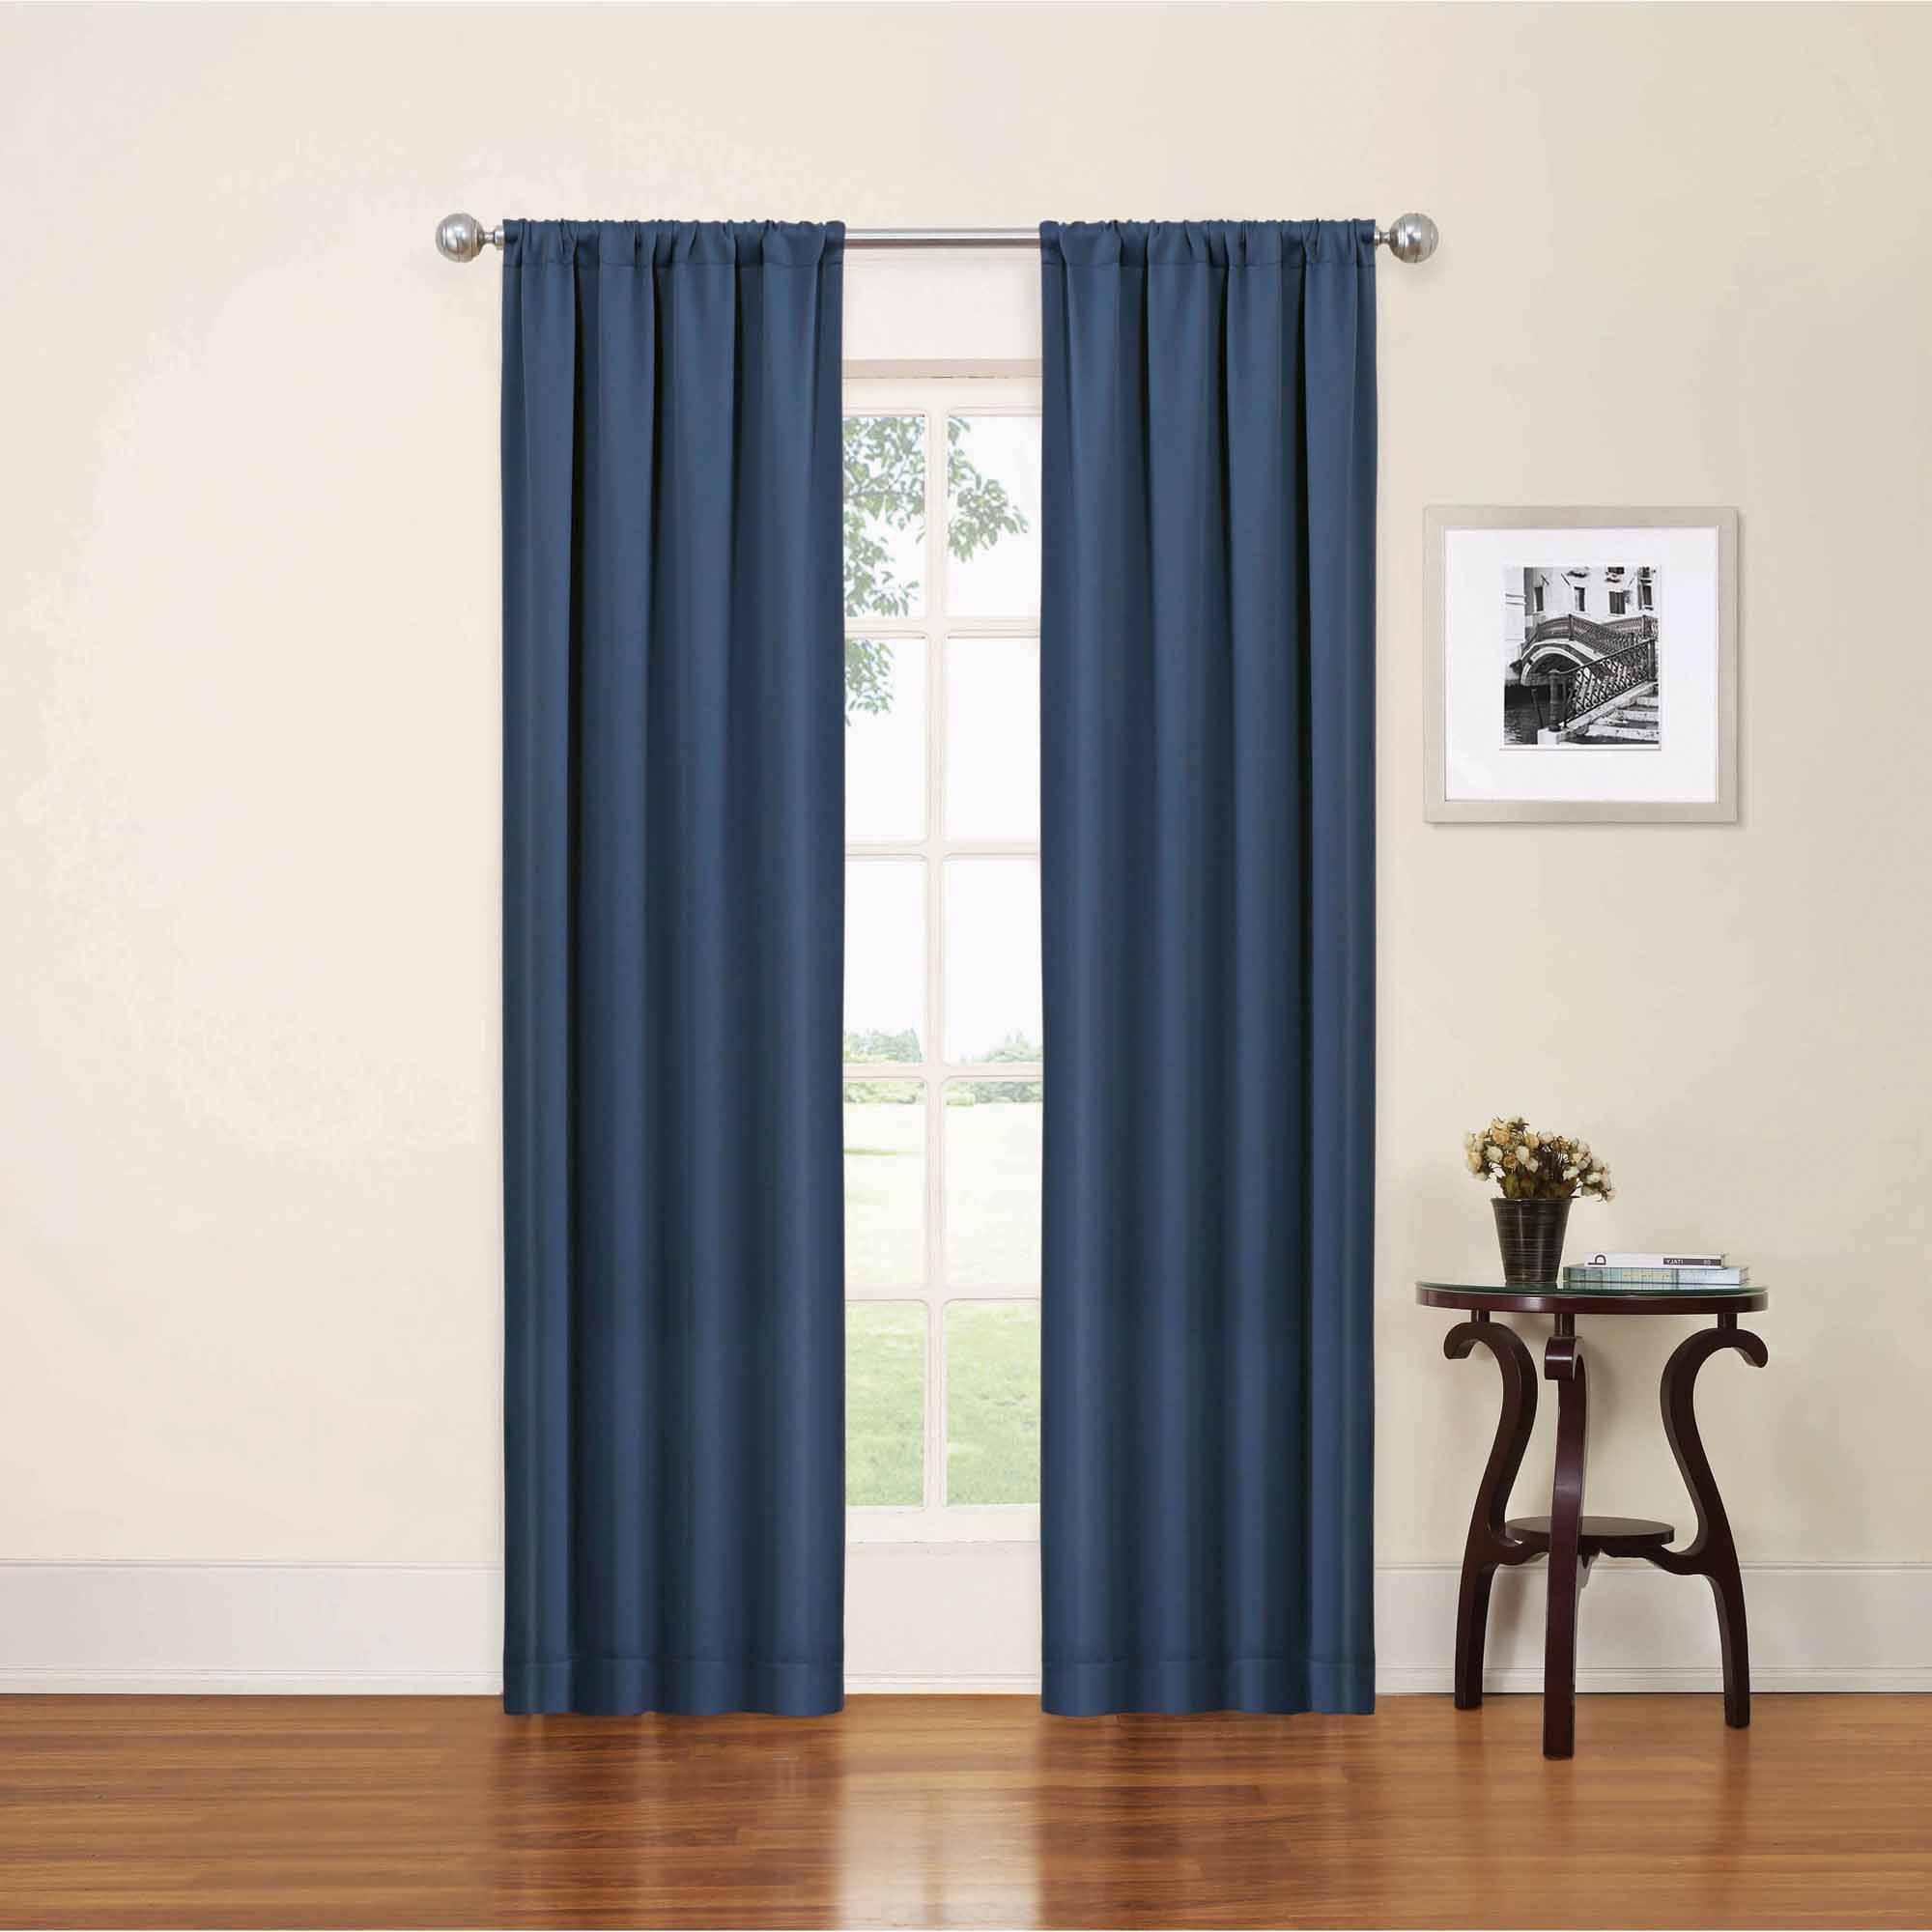 Eclipse Phoenix Blackout Window Curtain Panel Pair Regarding Well Known Room Darkening Window Curtain Panel Pairs (View 12 of 20)